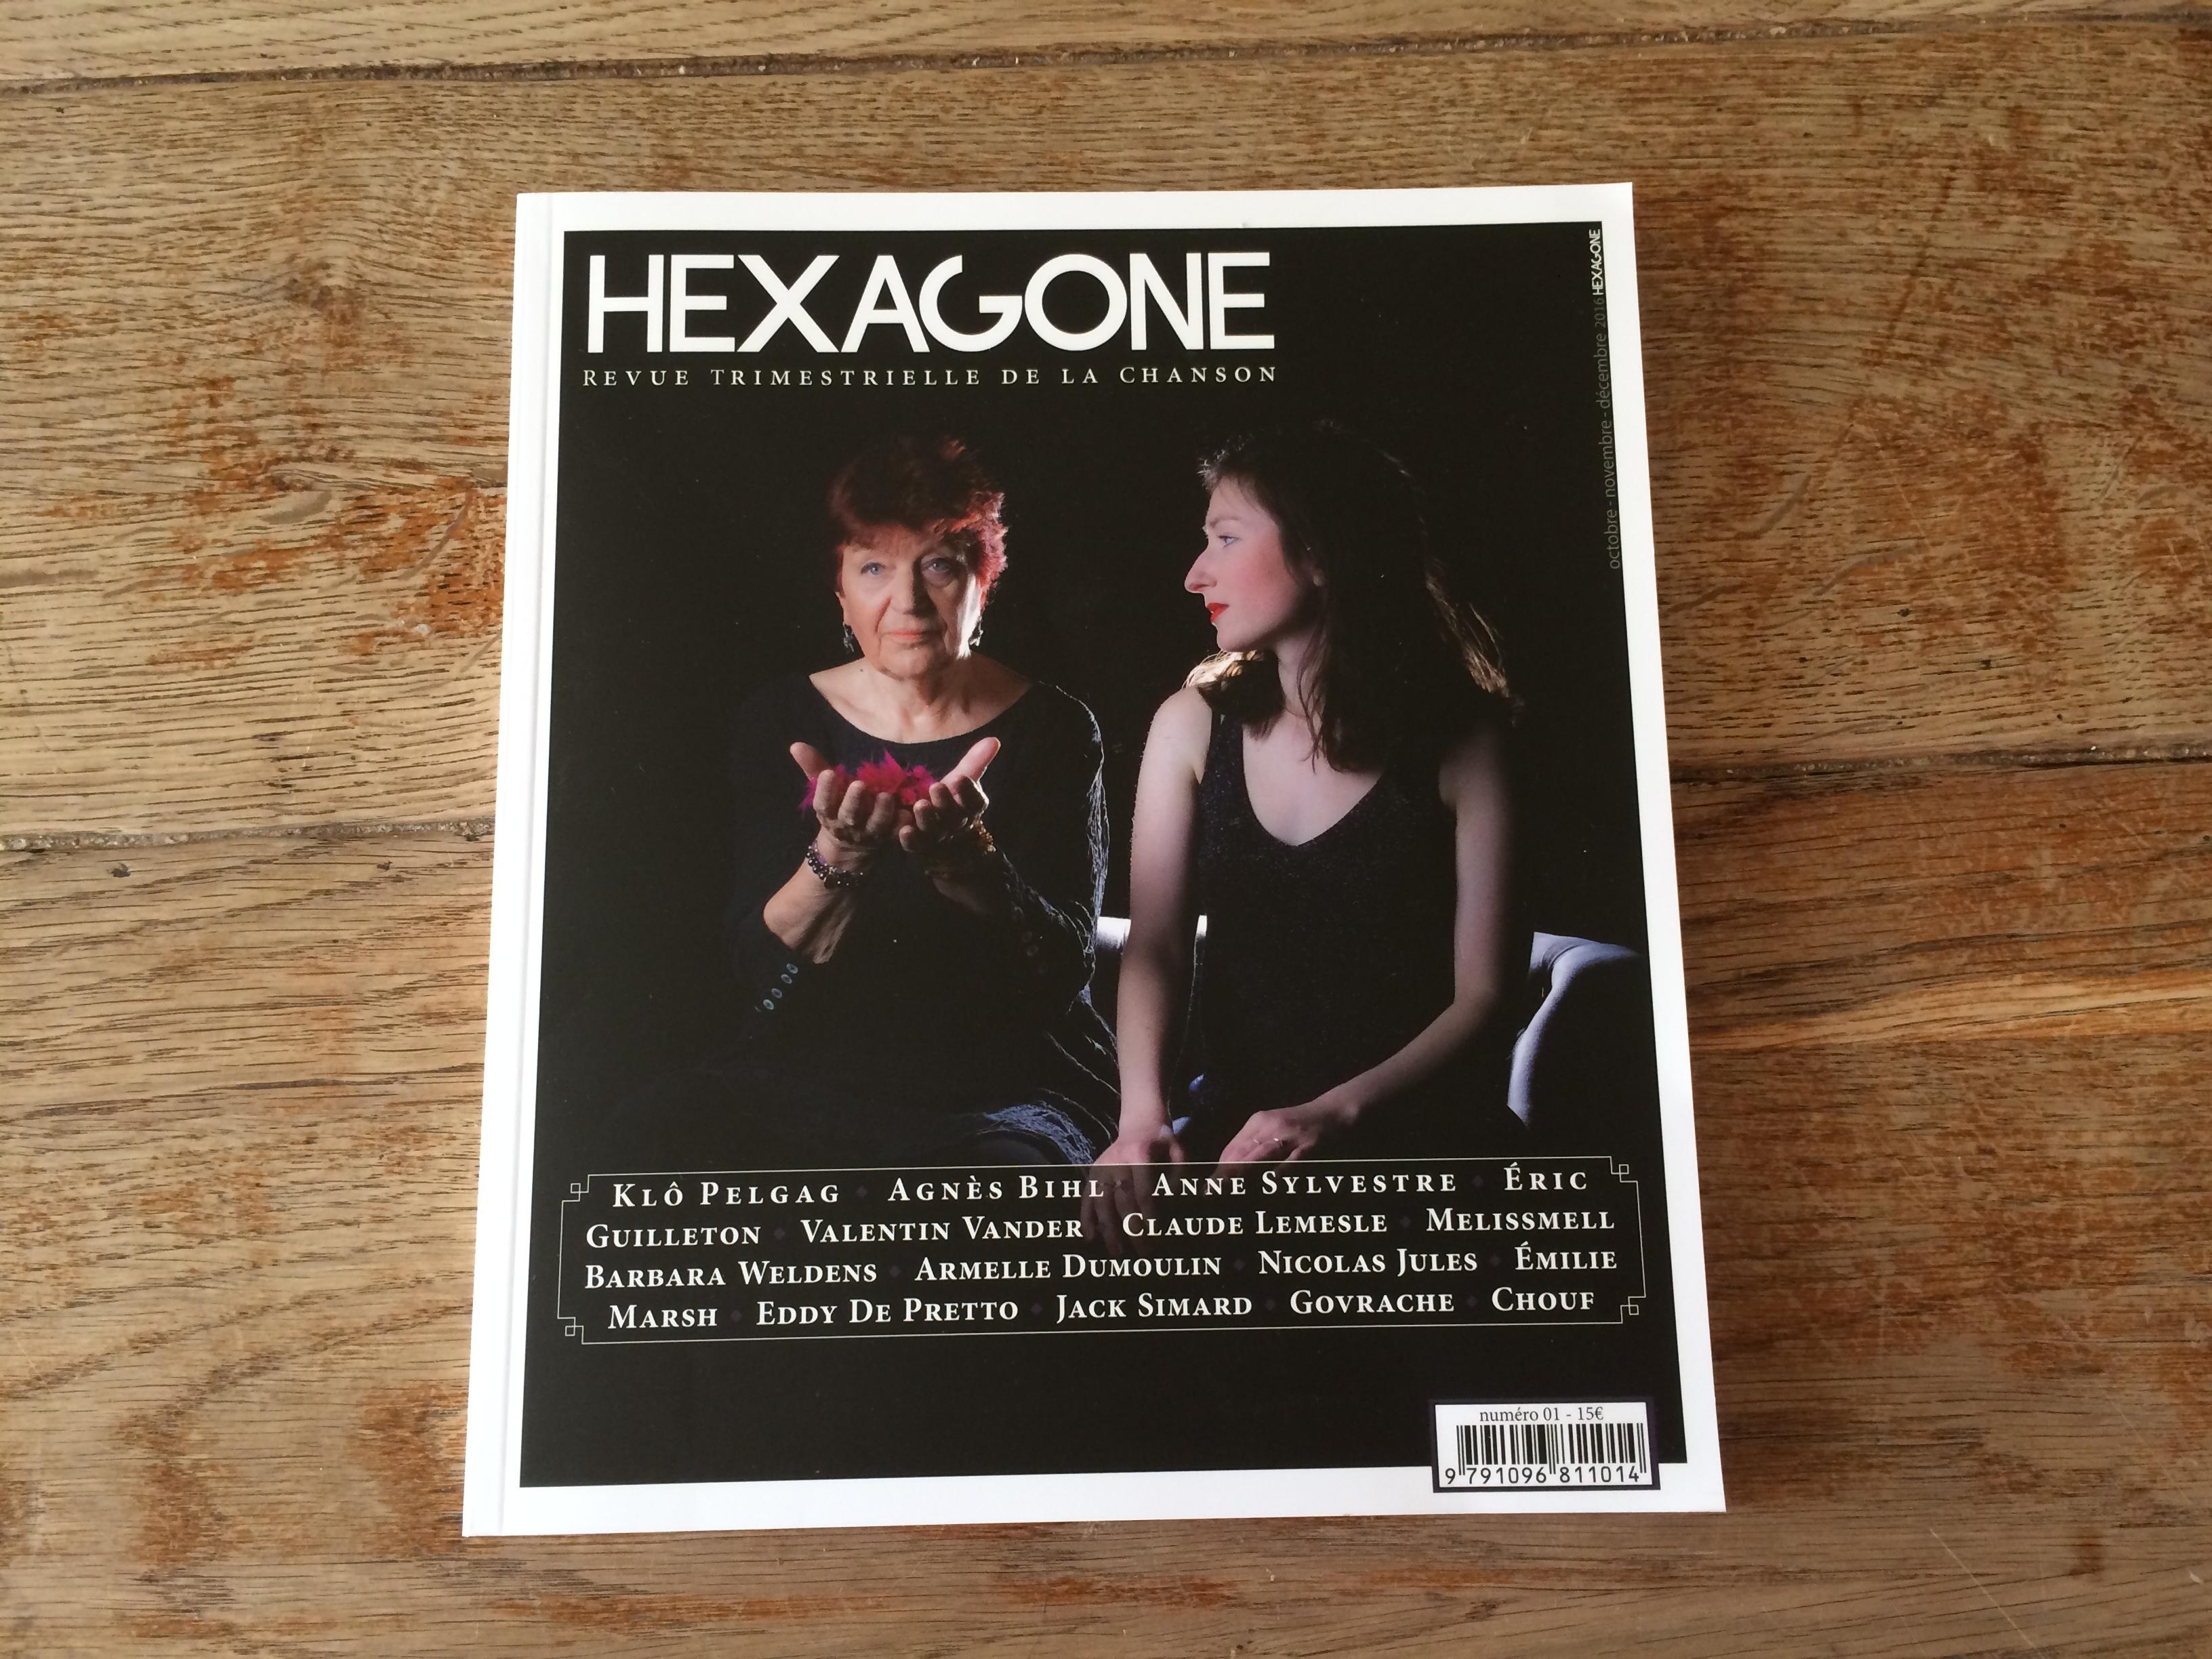 La revue trimestrielle Hexagone. @MD